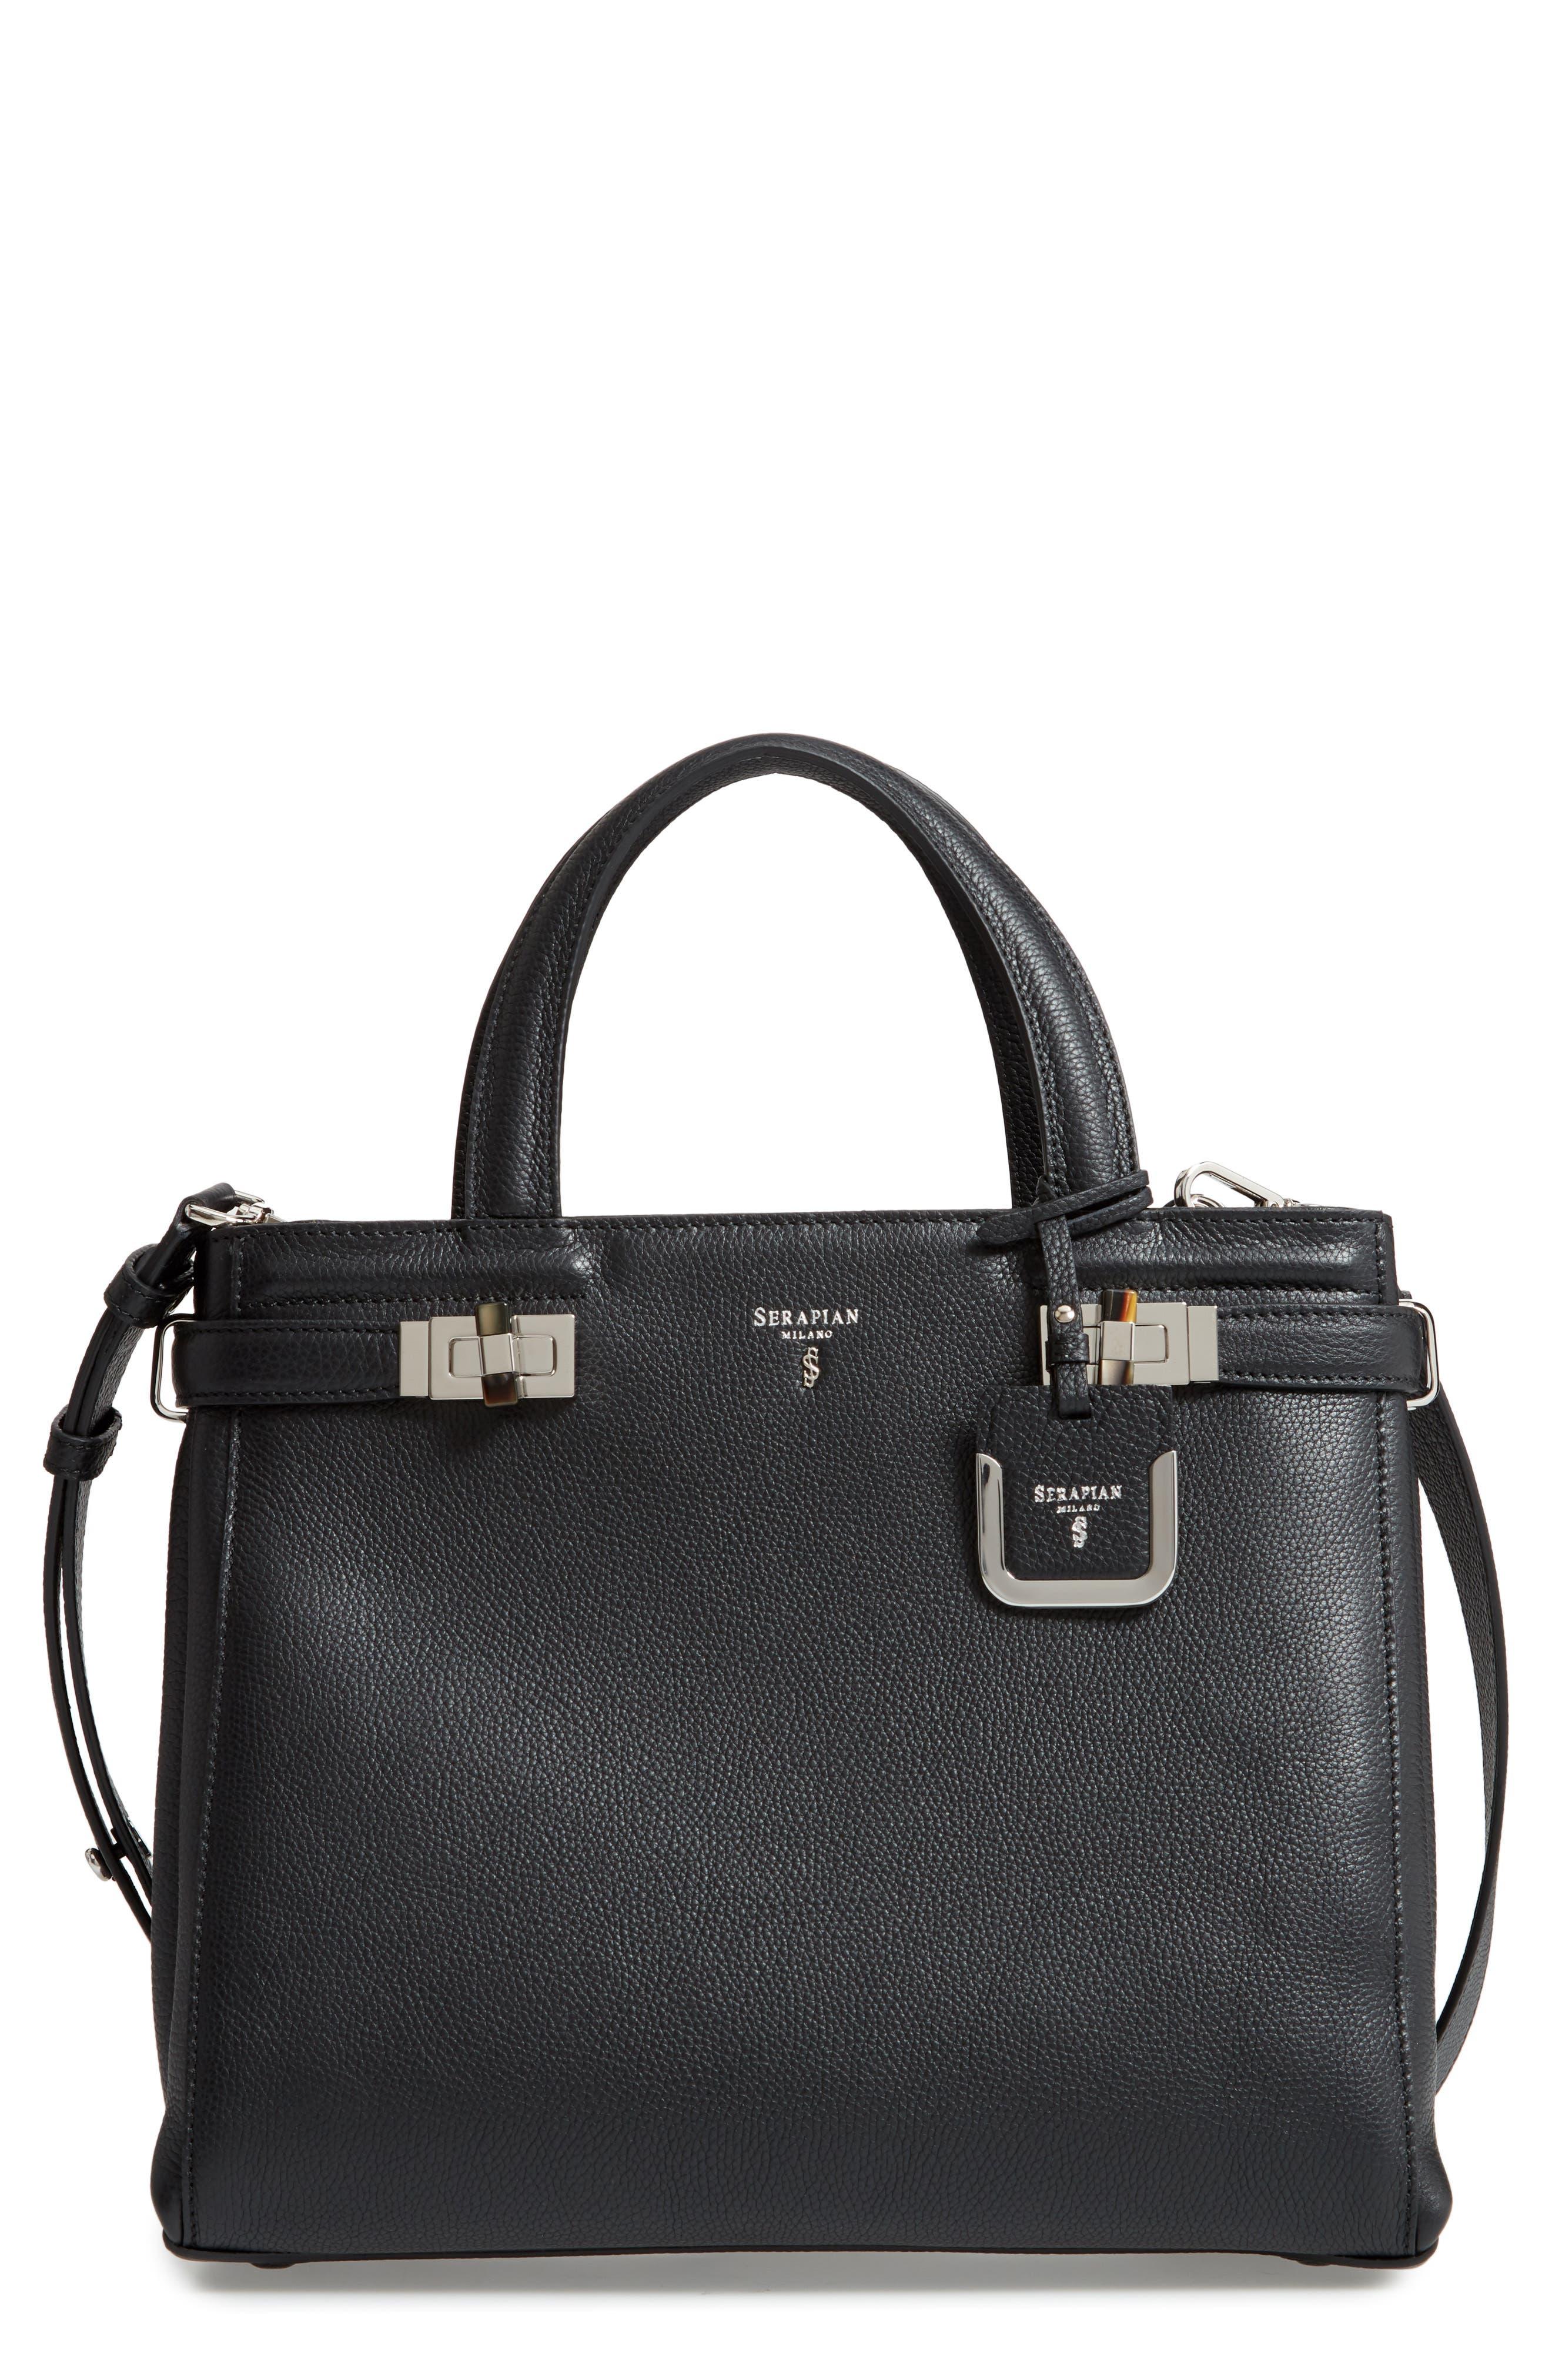 Small Meline Evolution Leather Bag,                             Main thumbnail 1, color,                             BLACK